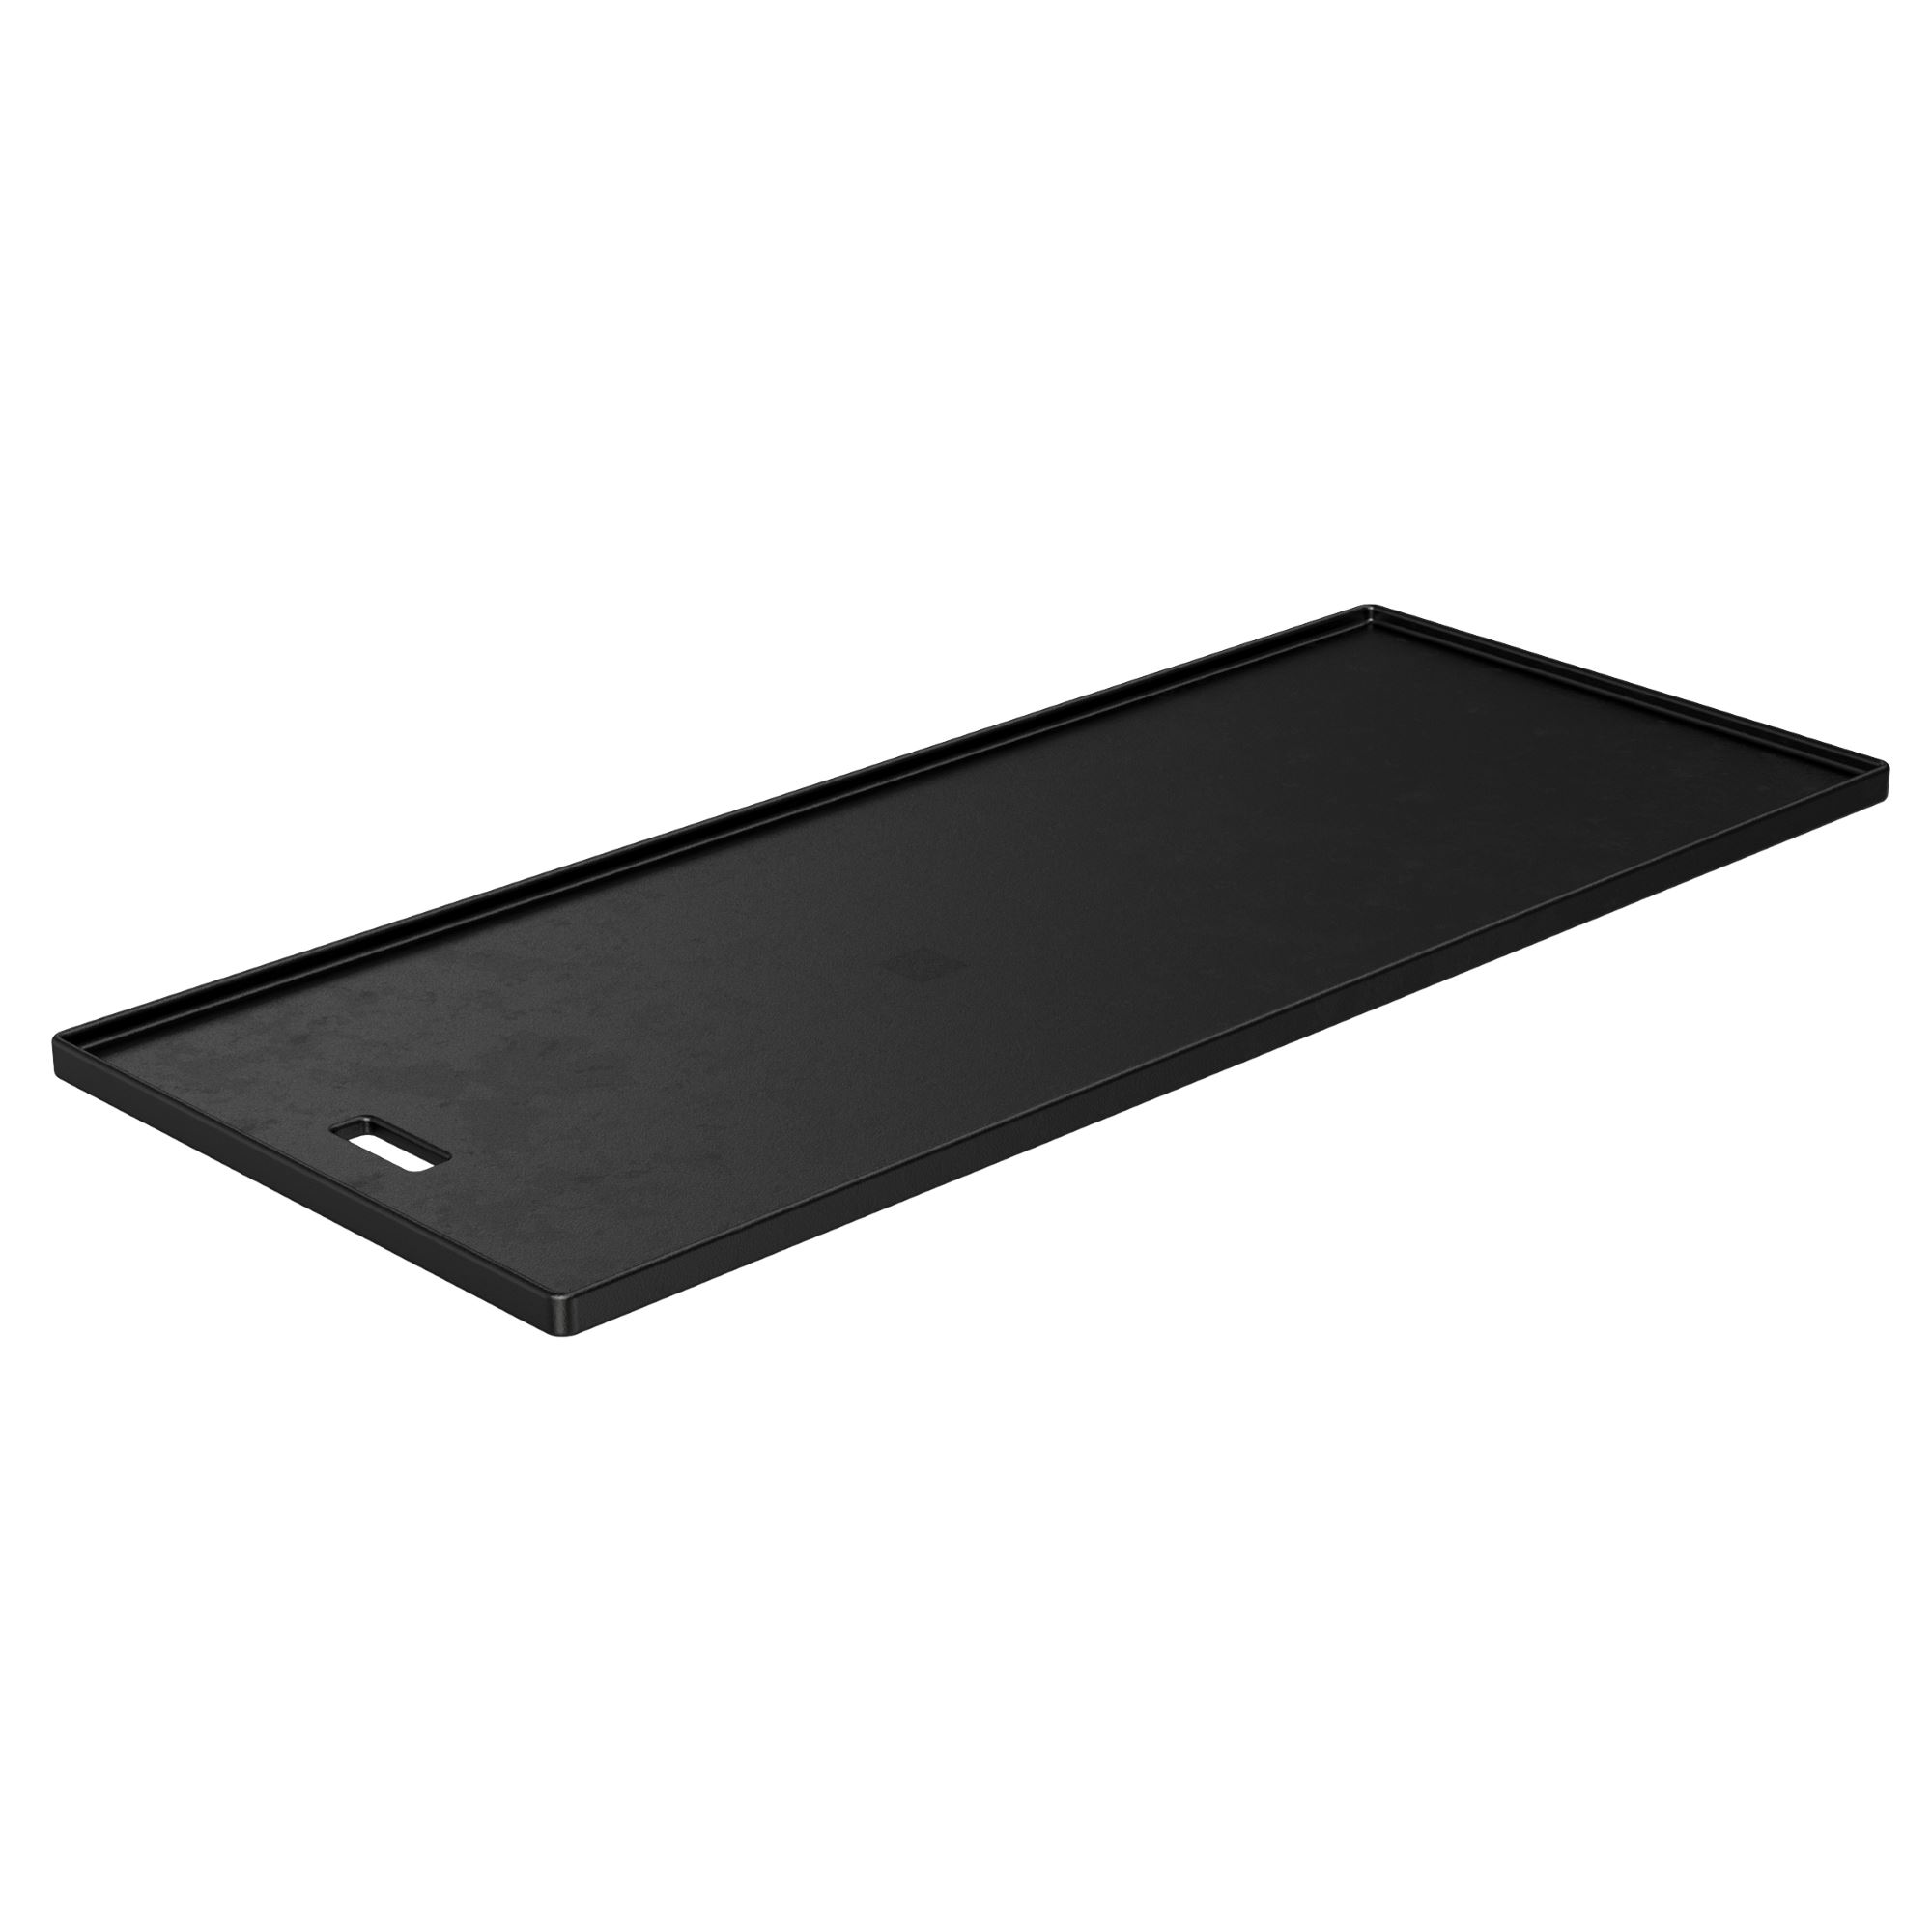 r sle bbq grillplatte aus gusseisen f r gasgrill videro g3. Black Bedroom Furniture Sets. Home Design Ideas